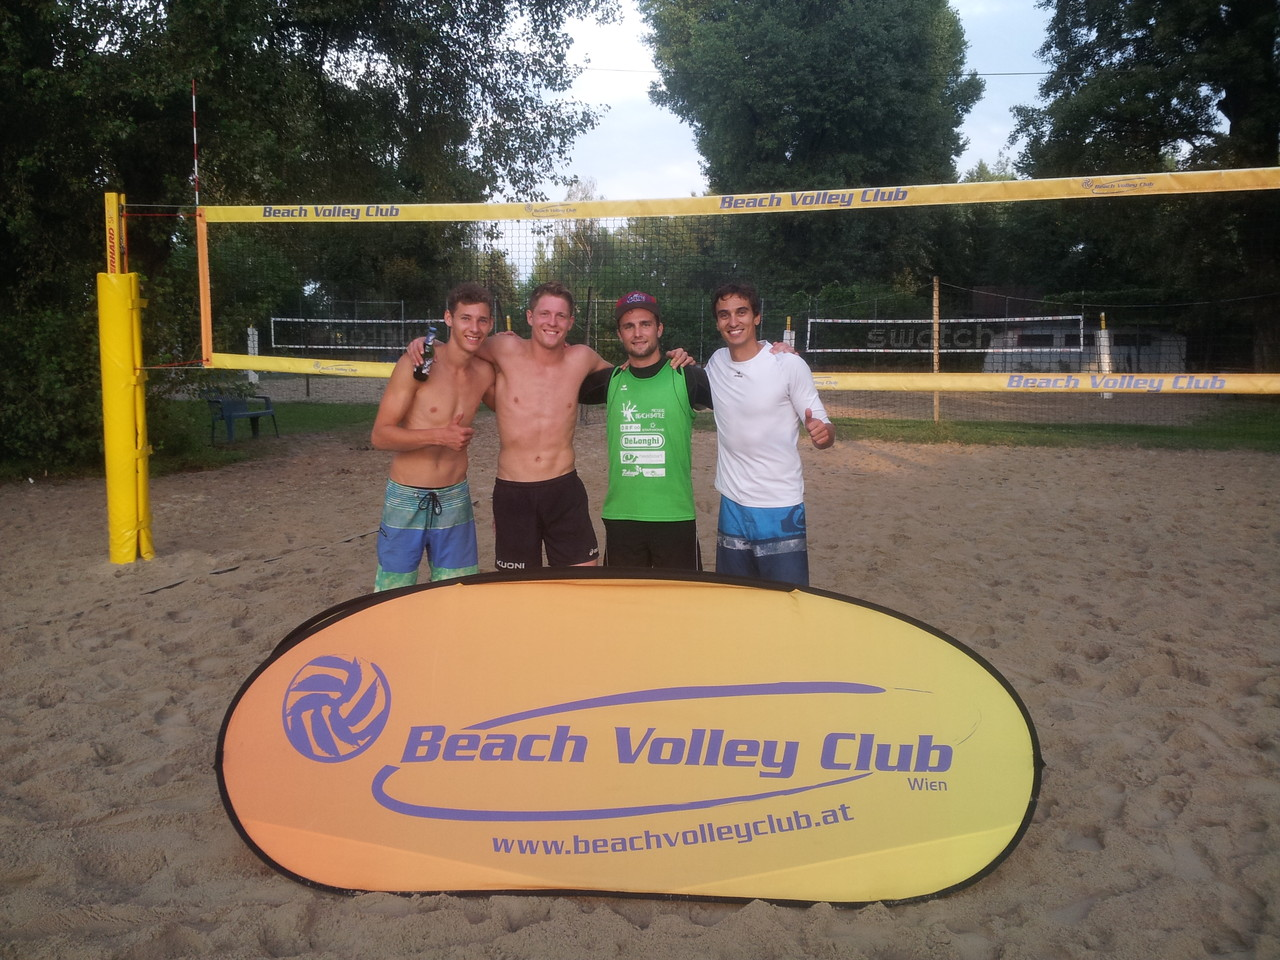 (c) Beachvolleyclub.at